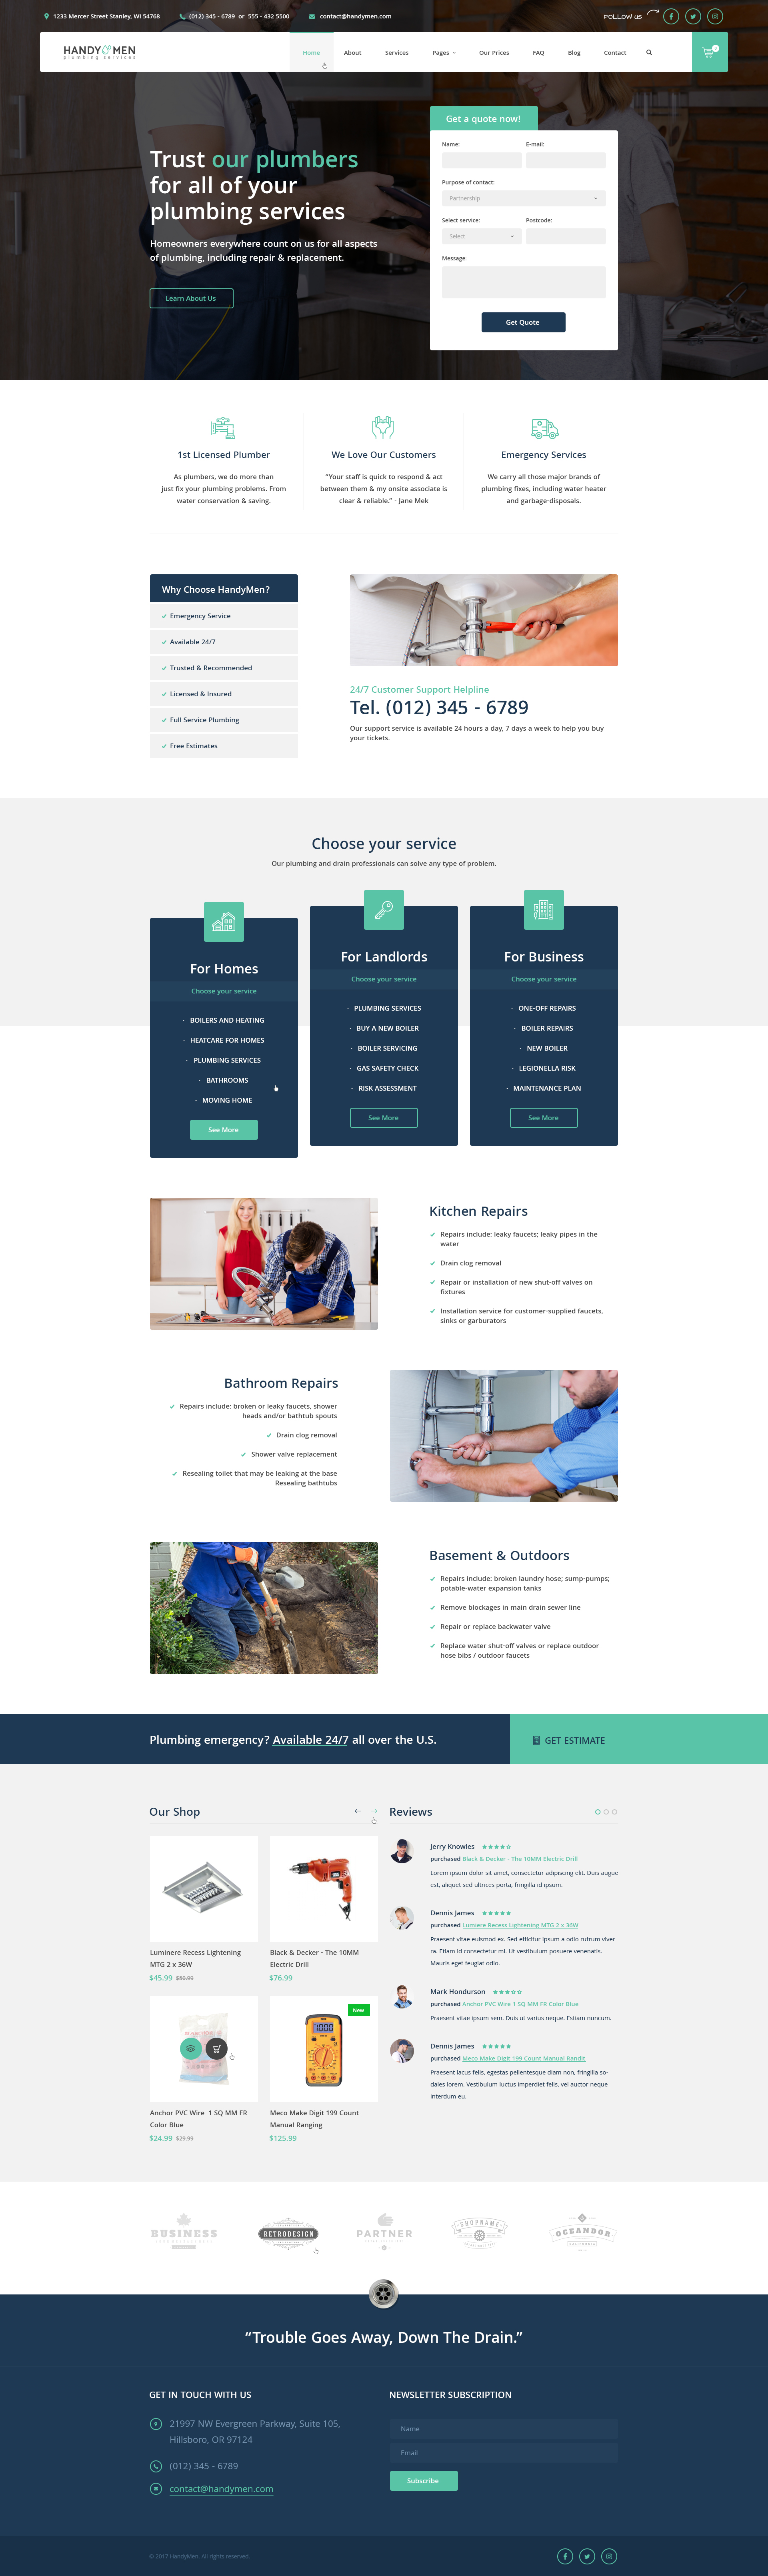 HandyMen - Plumbing & Electrical Services PSD Template by diadea3007